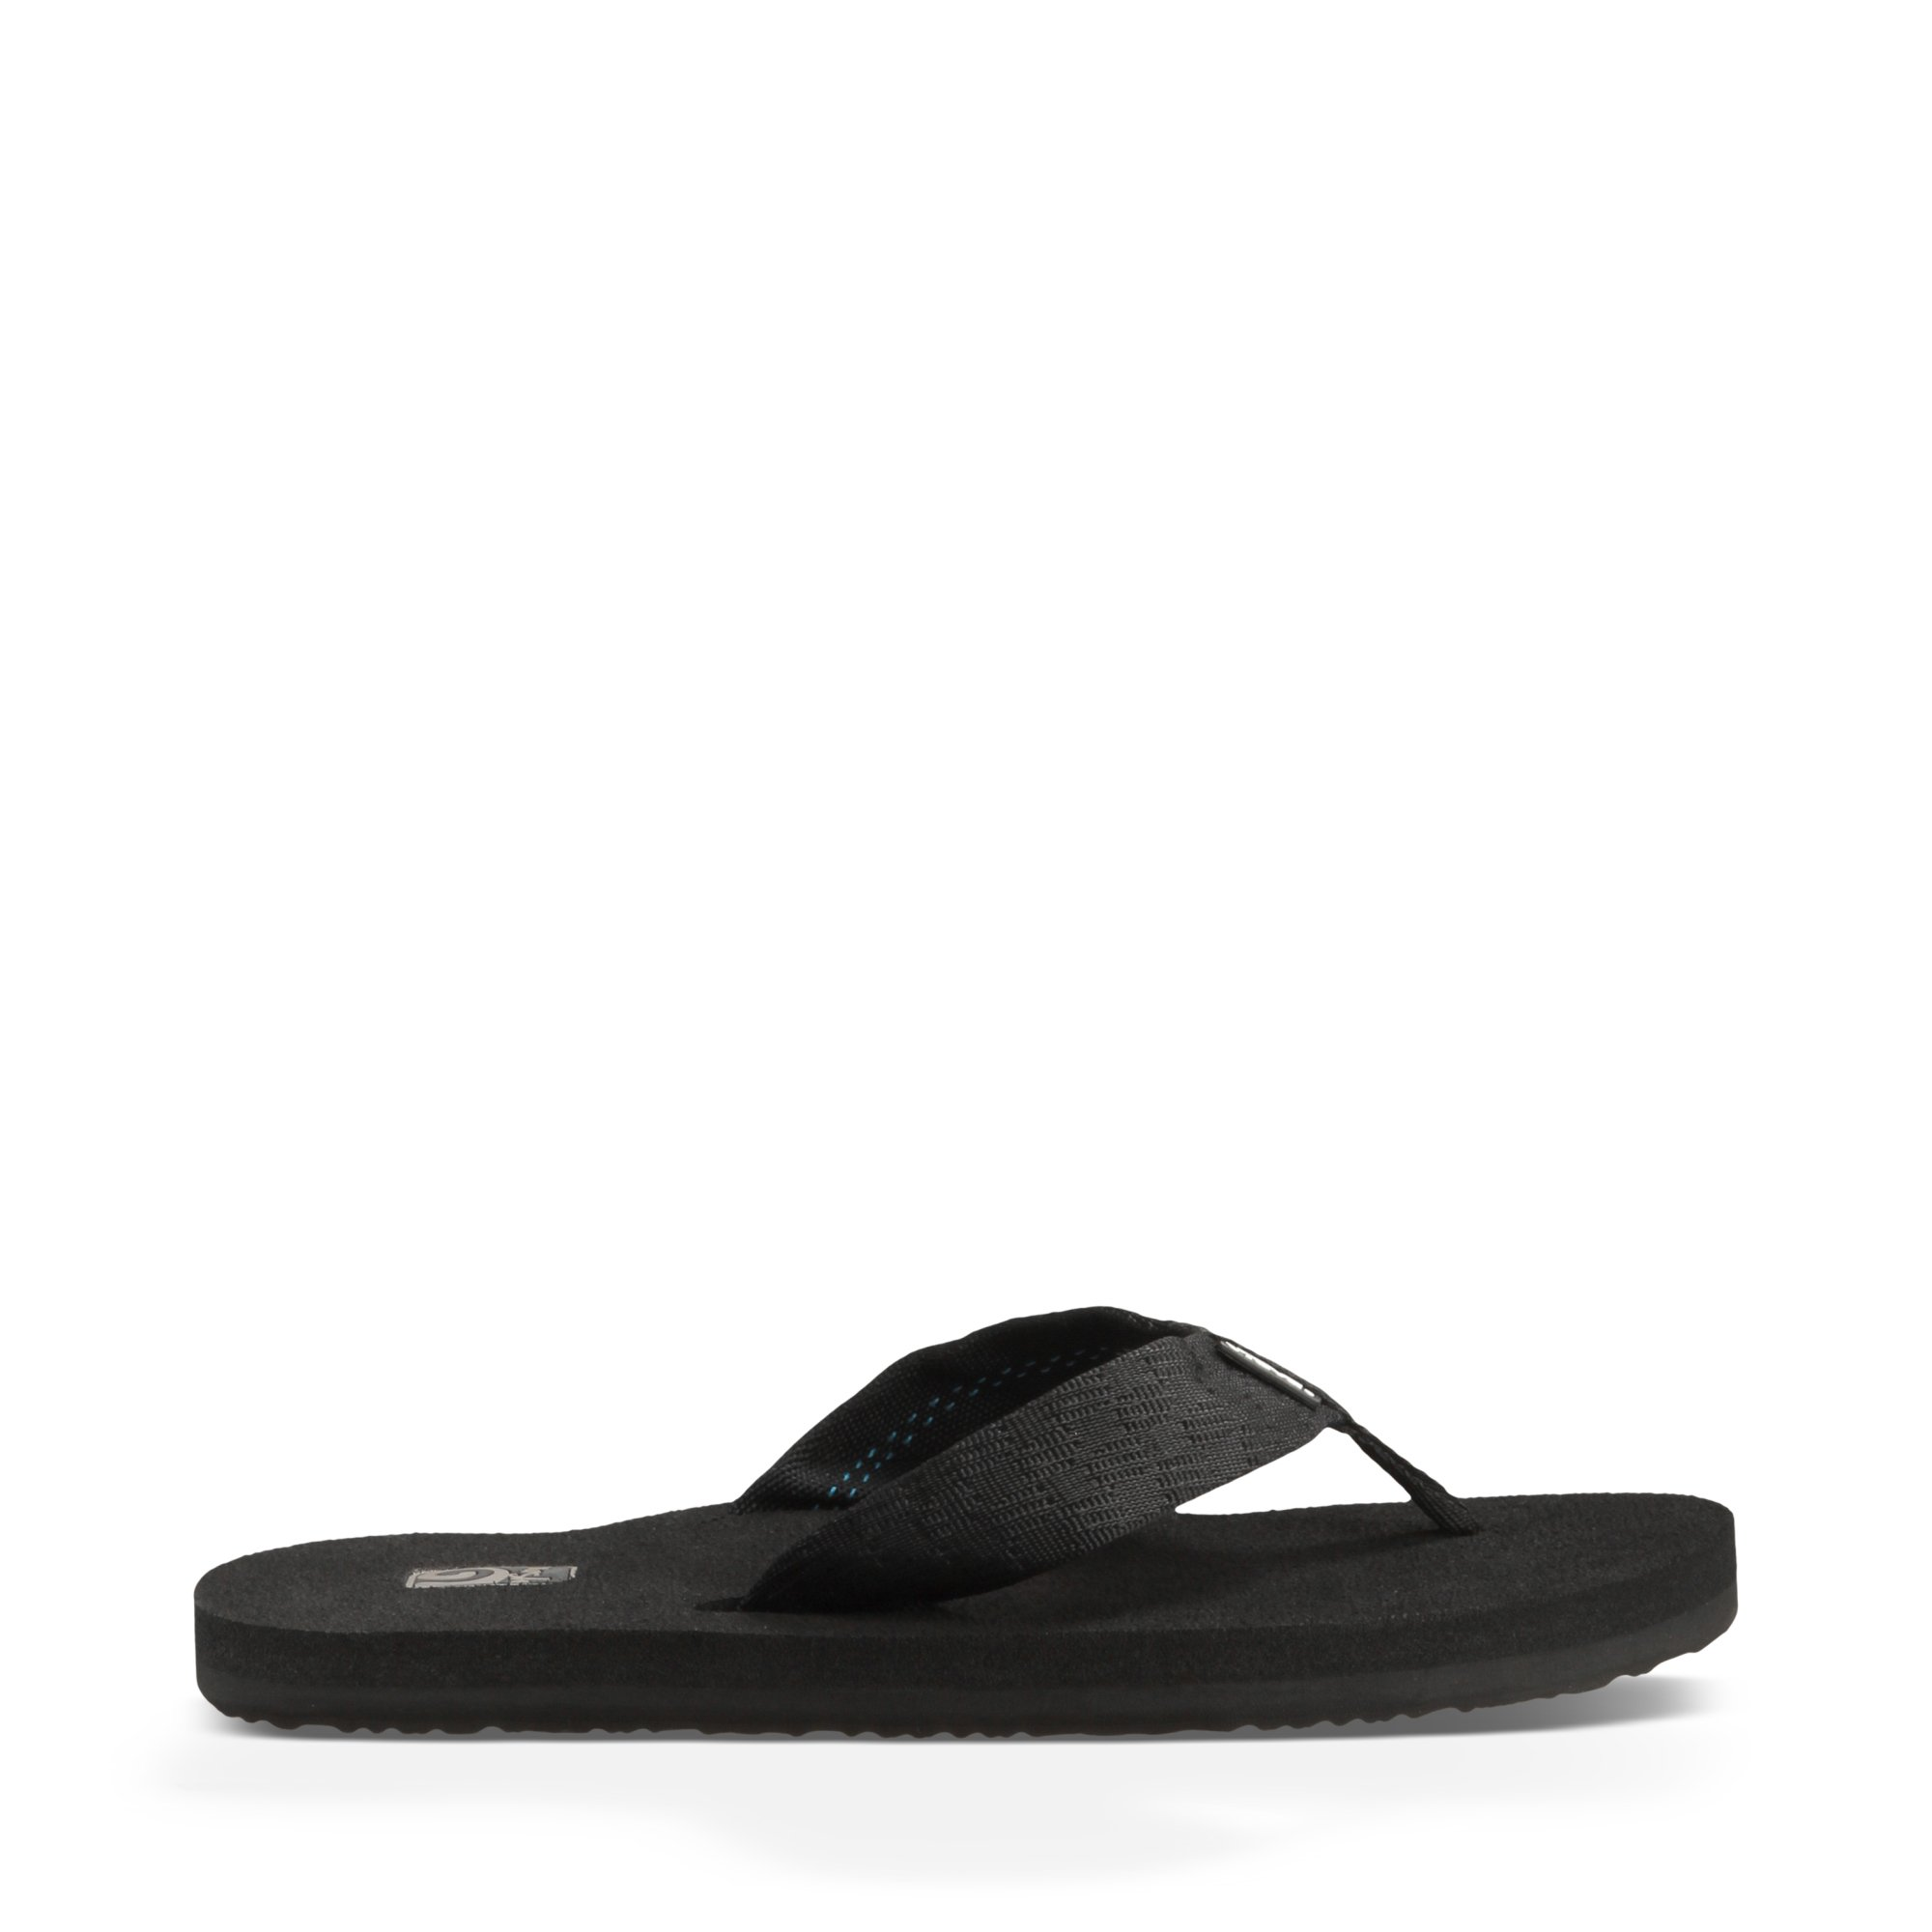 Teva Men's Mush II Flip Flop,Brick Black,10 M US